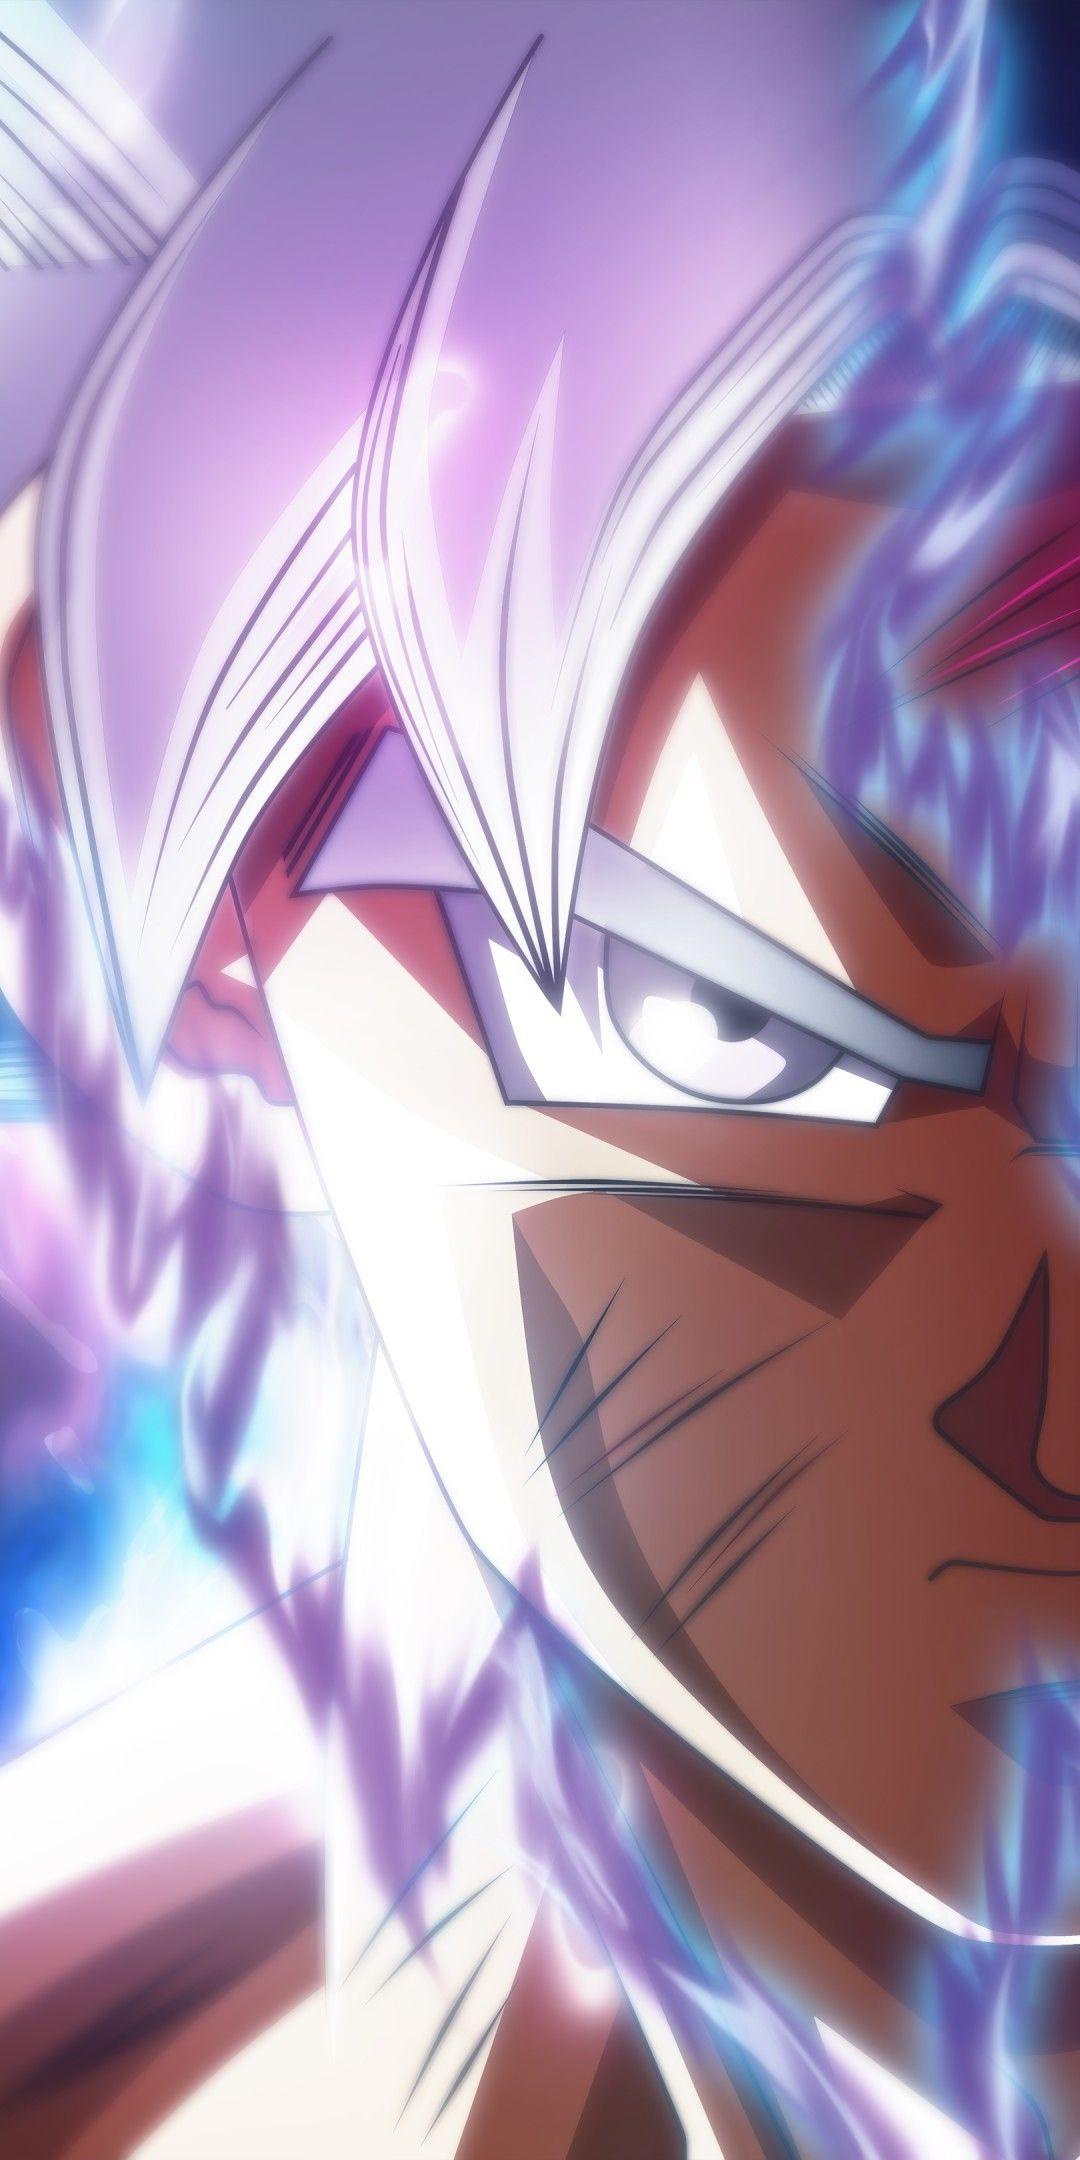 Pin By Daniela Escate On Son Goku Anime Dragon Ball Super Dragon Ball Wallpapers Dragon Ball Artwork